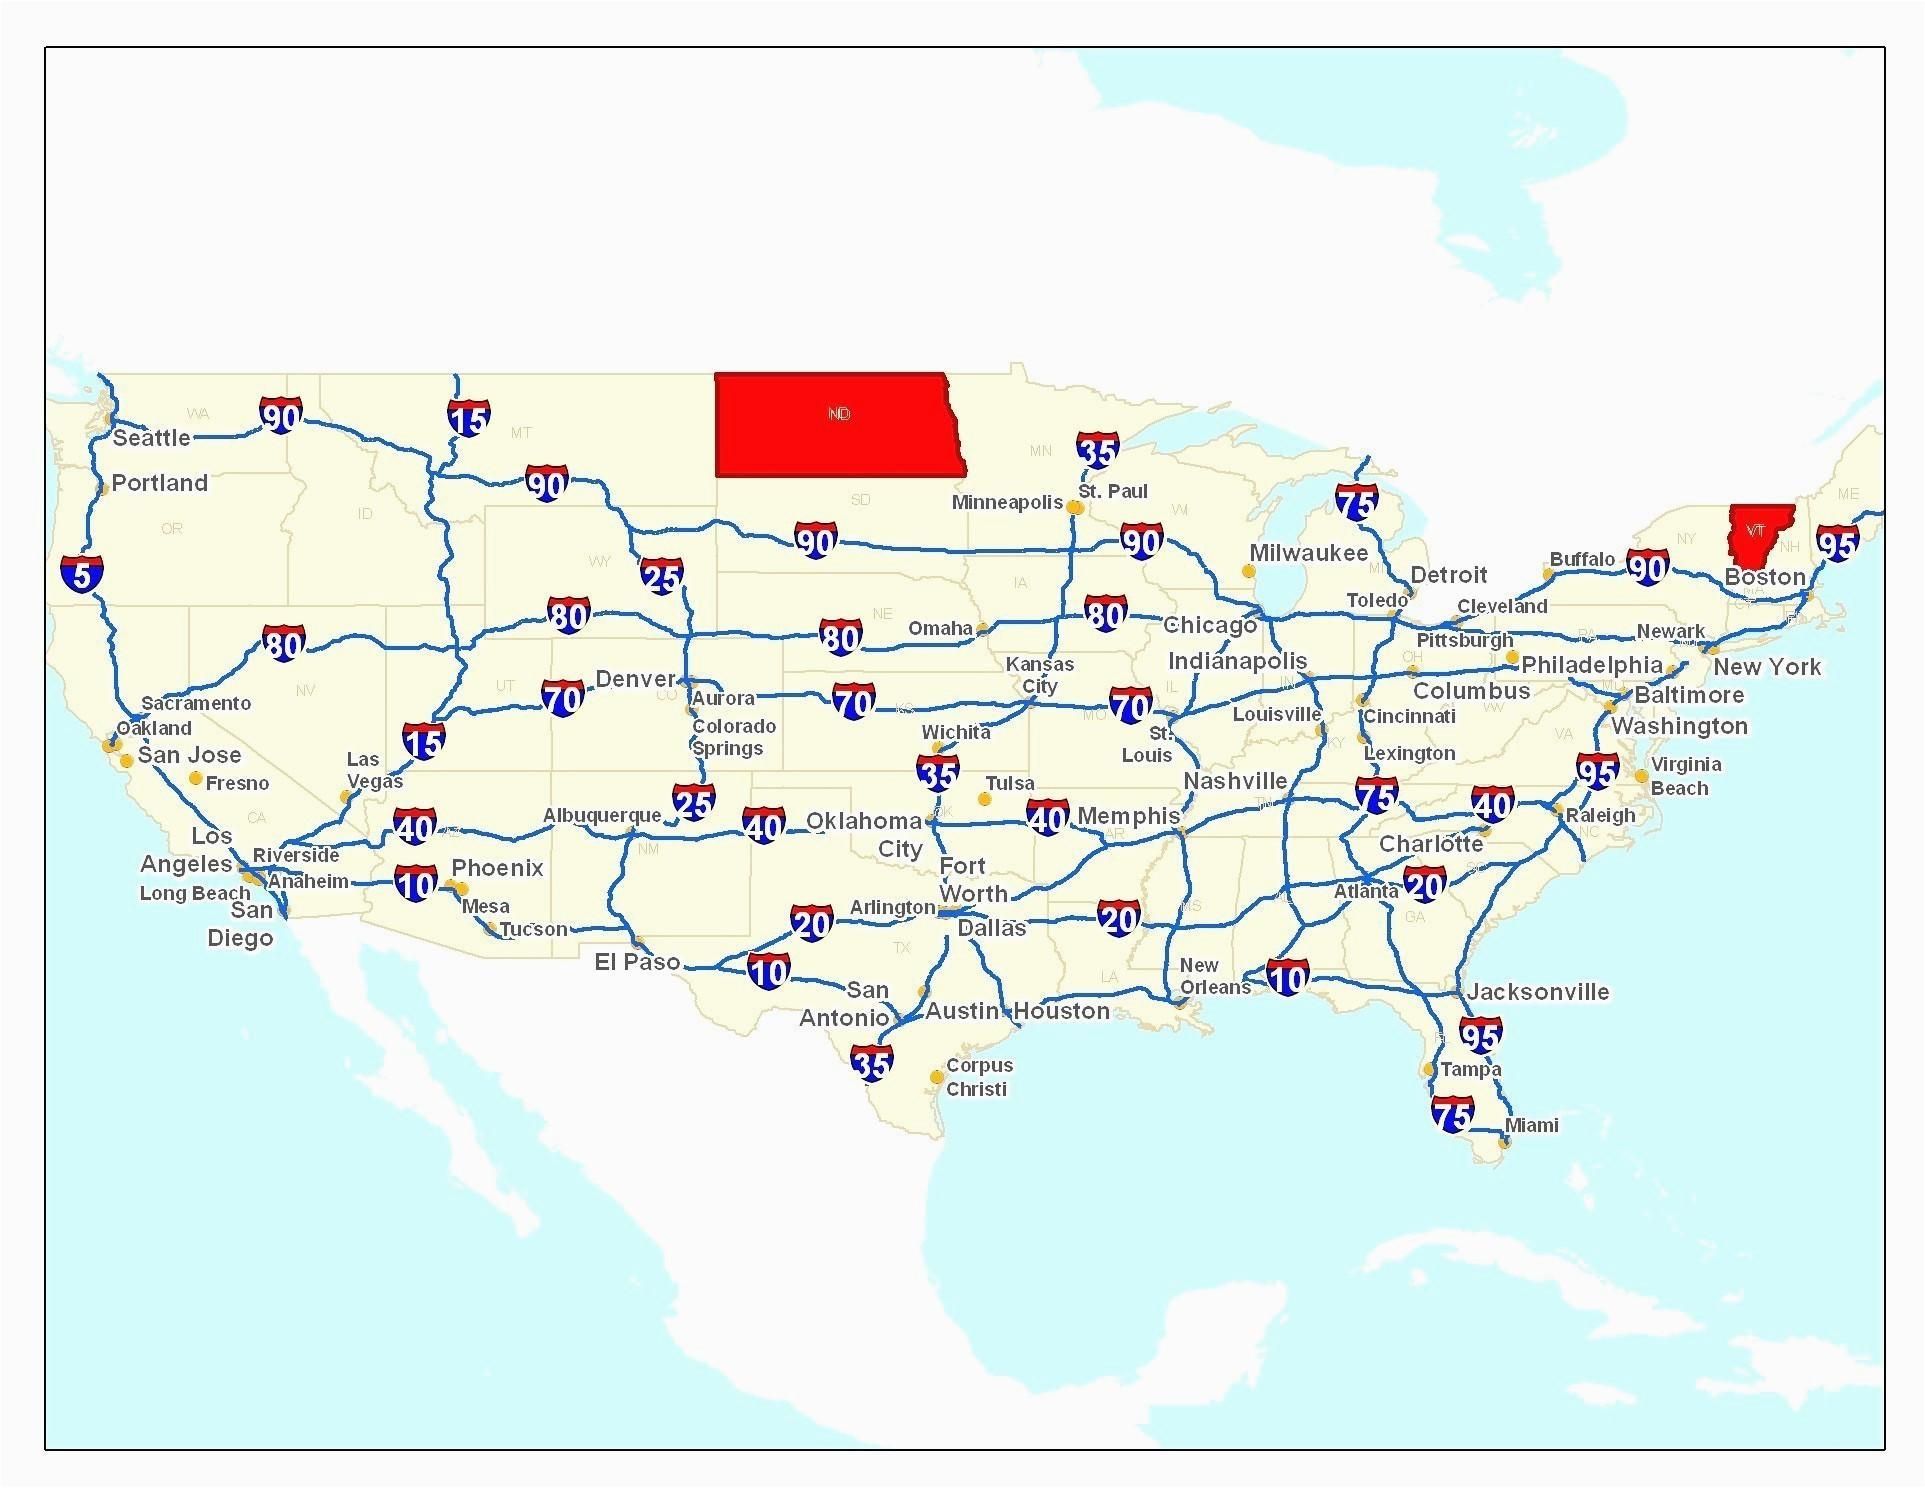 map of south dakota wyoming and colorado, detroit map colorado, large map of colorado, map of kansas and colorado, cities and towns in colorado, kansas to colorado, printable map of colorado, map of southeast colorado, states that border colorado, kansas colorado border, mountain road map colorado, on kansas road map colorado